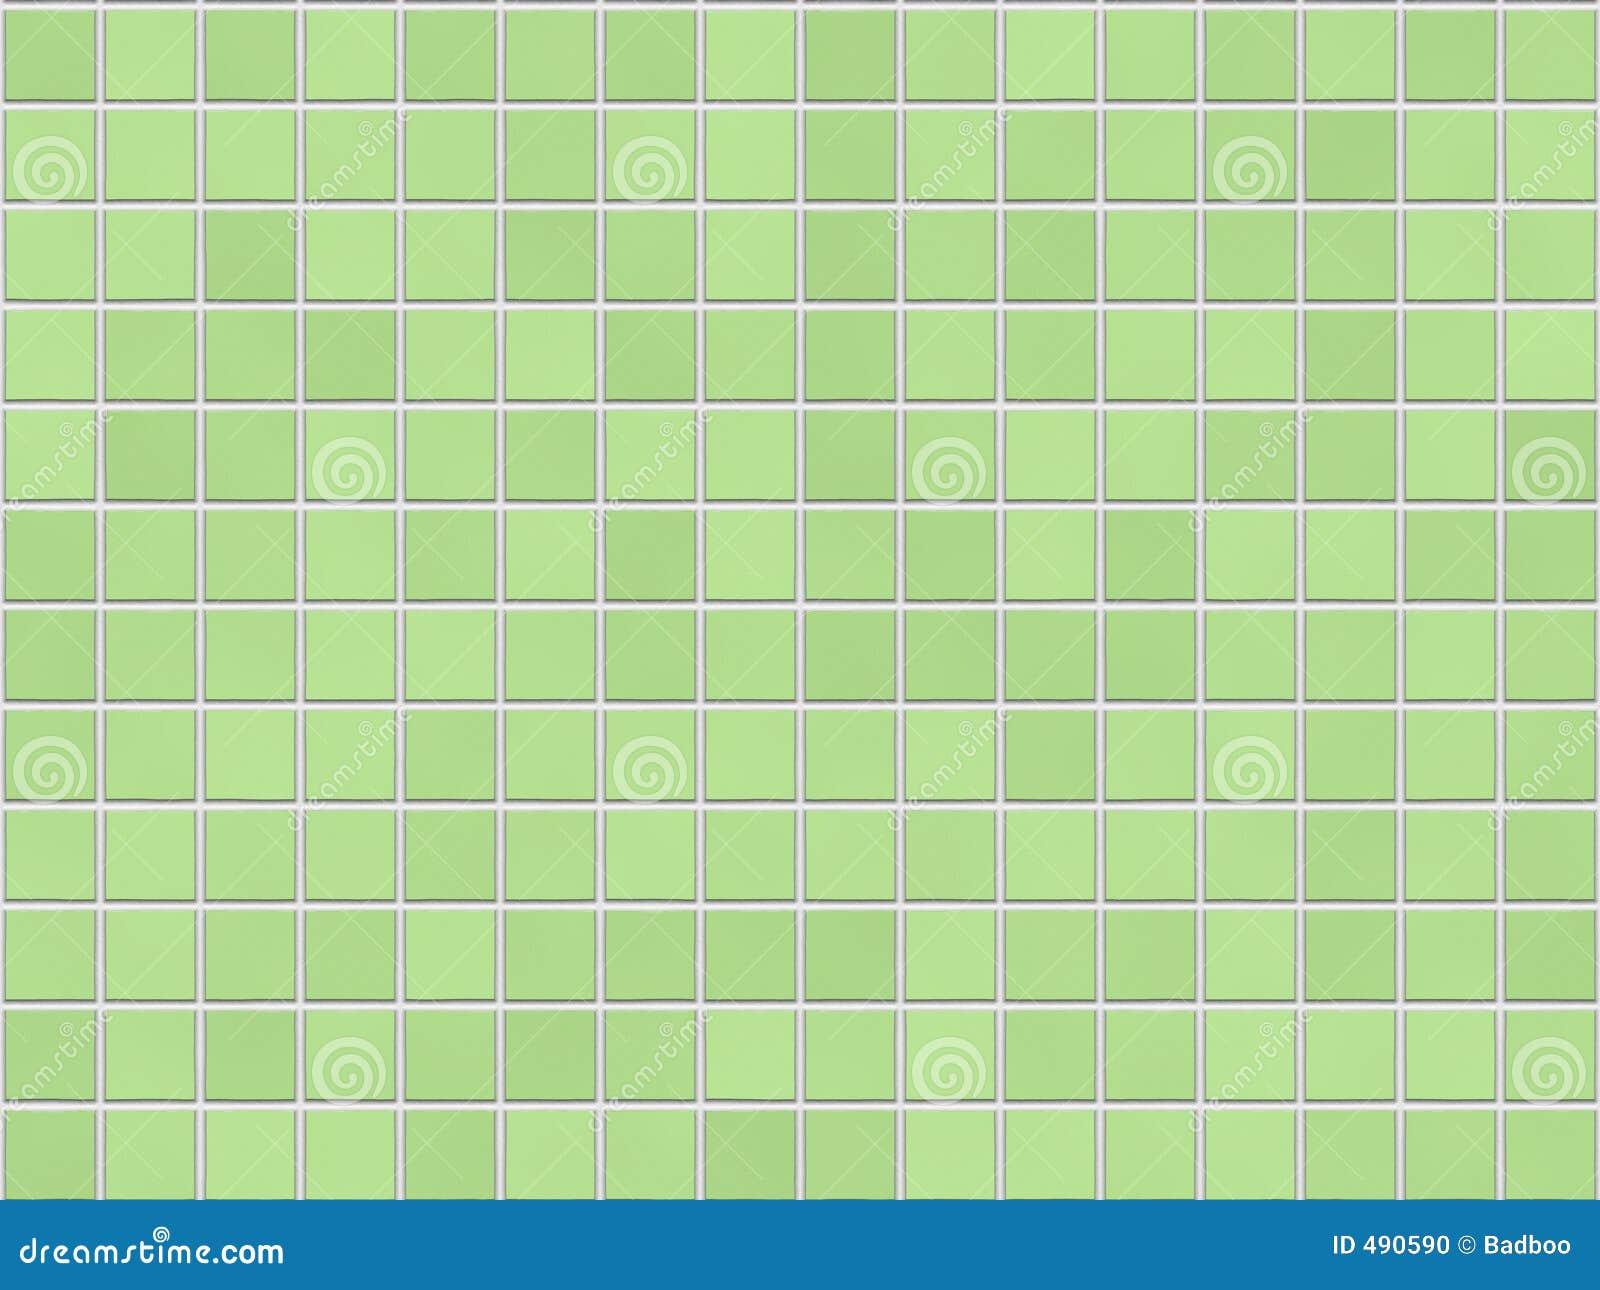 Tiles For Kids Bathroom Green Tile Background Stock Photo - Image: 490590